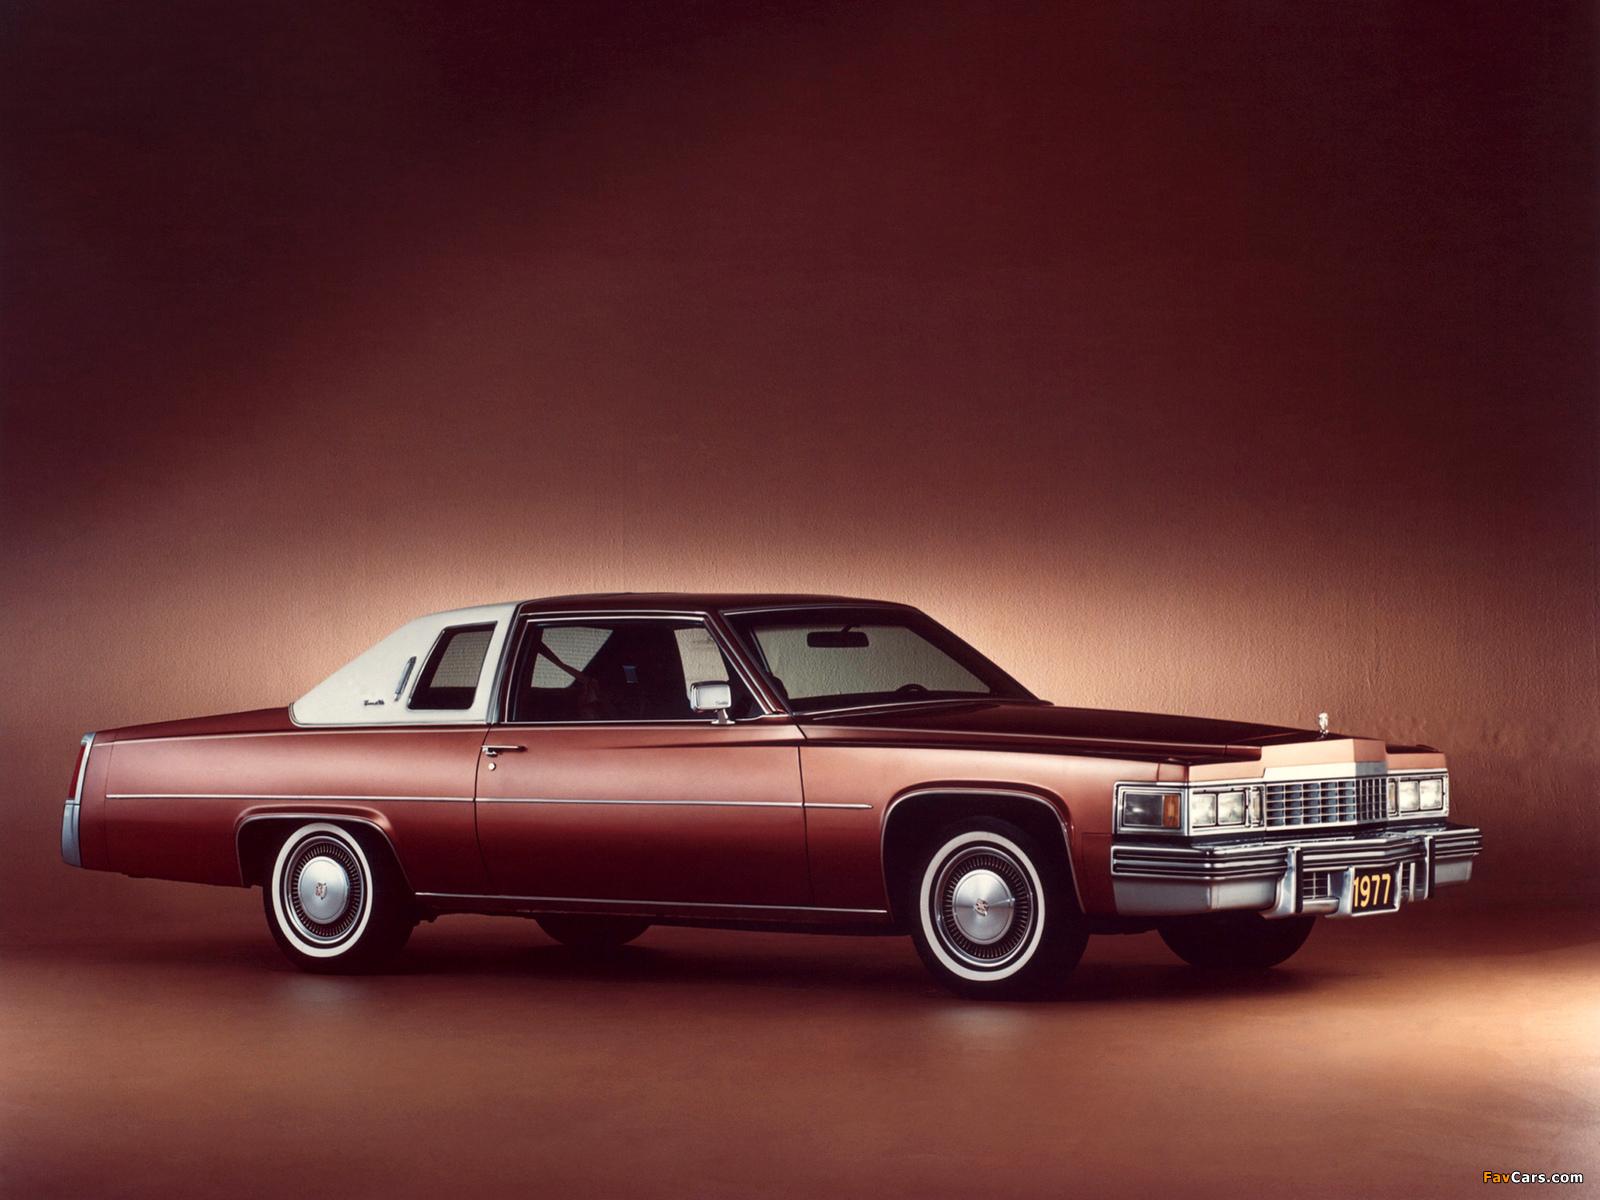 Pictures of Cadillac Coupe de Ville 1977 (1600 x 1200)